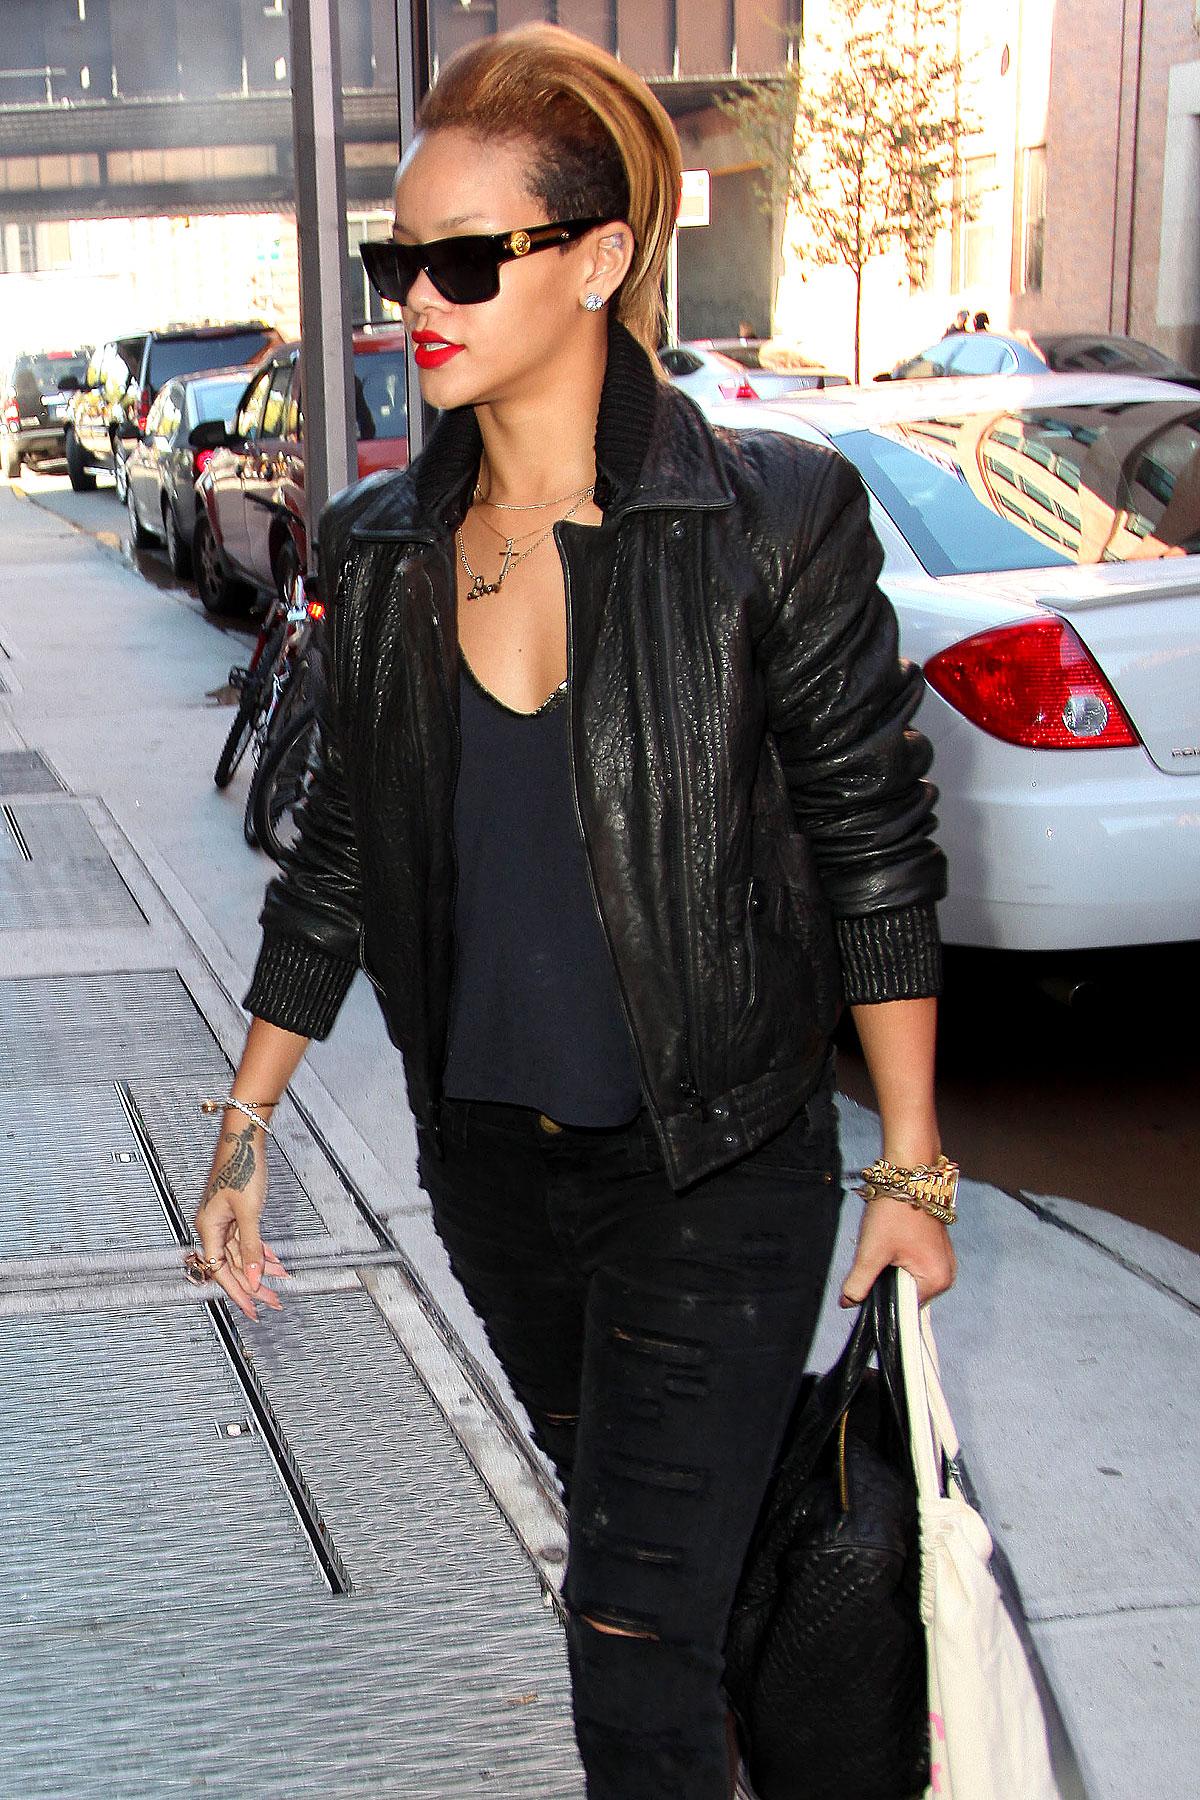 PHOTO GALLERY: Rihanna at Milk Studios and Music Video Shoot